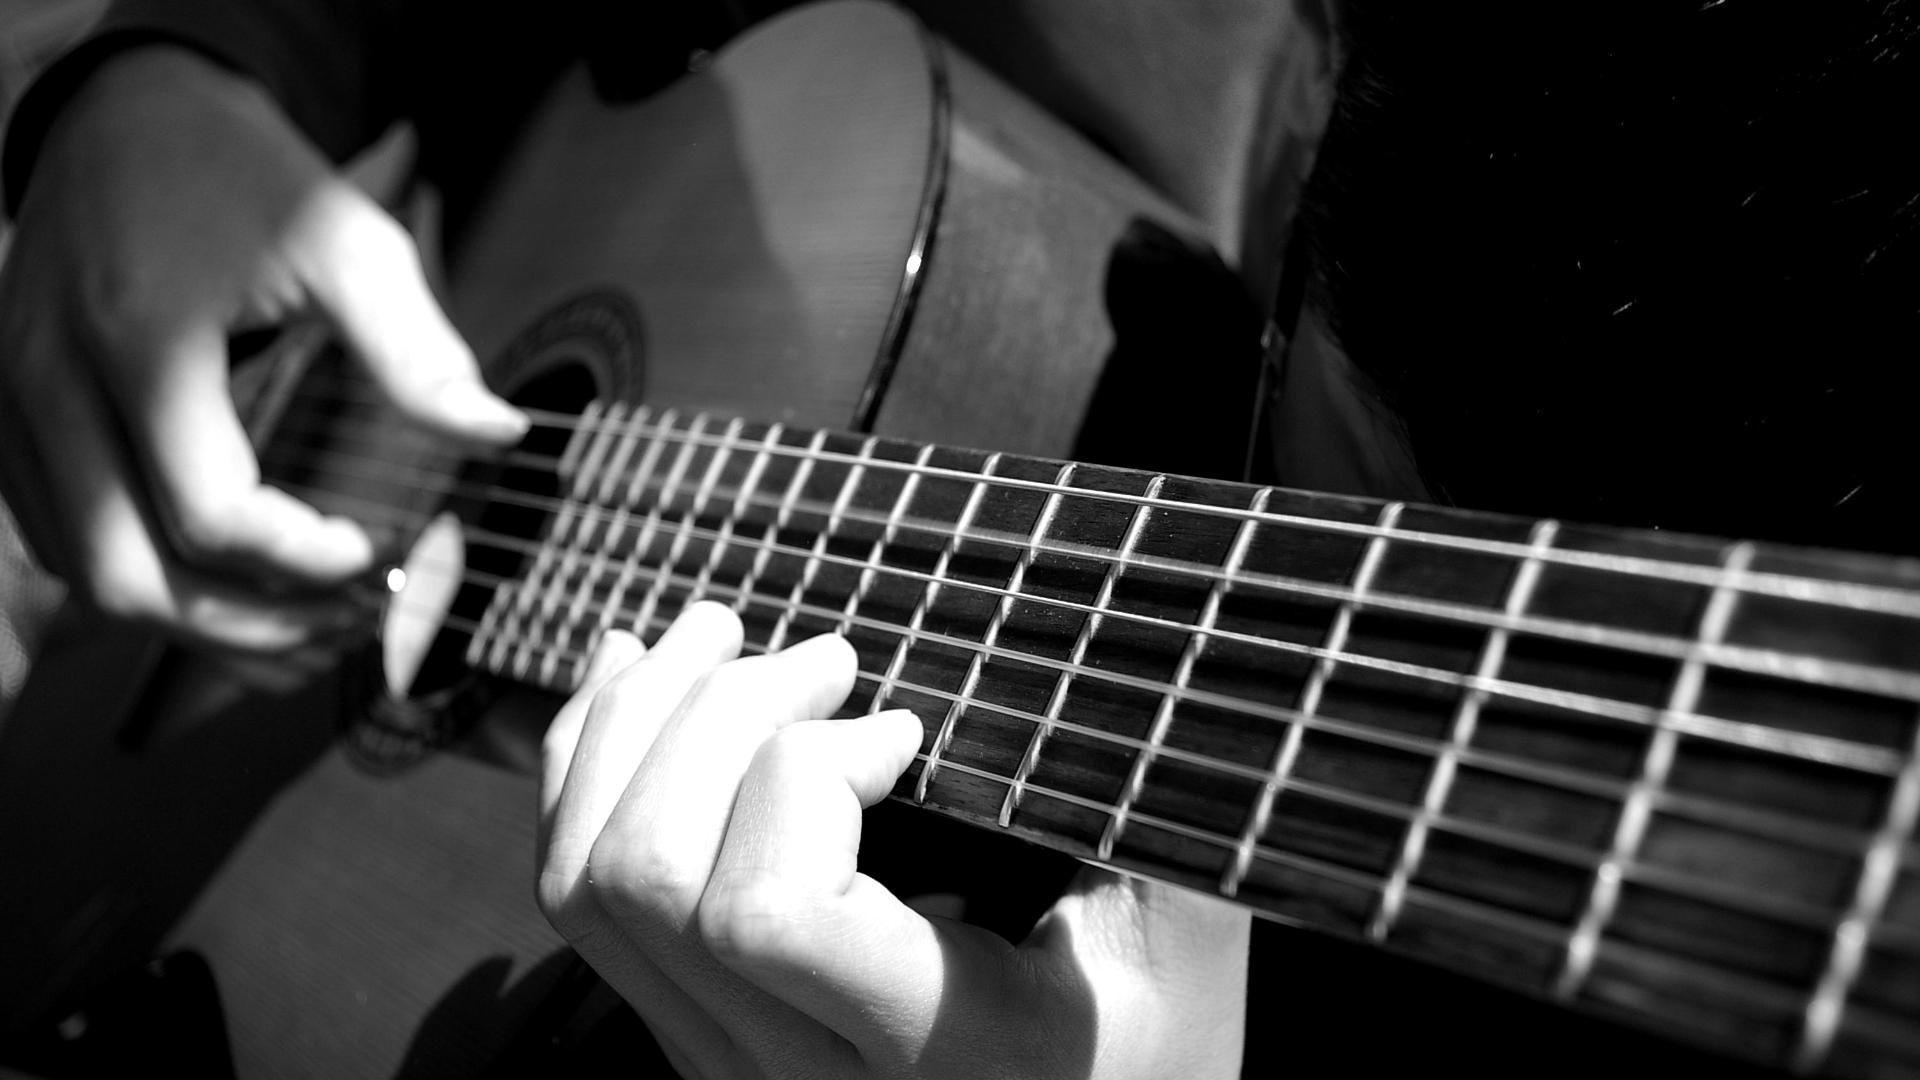 Acoustic Guitar Hd Wallpaper #1051 Wallpaper | walldesktophd.